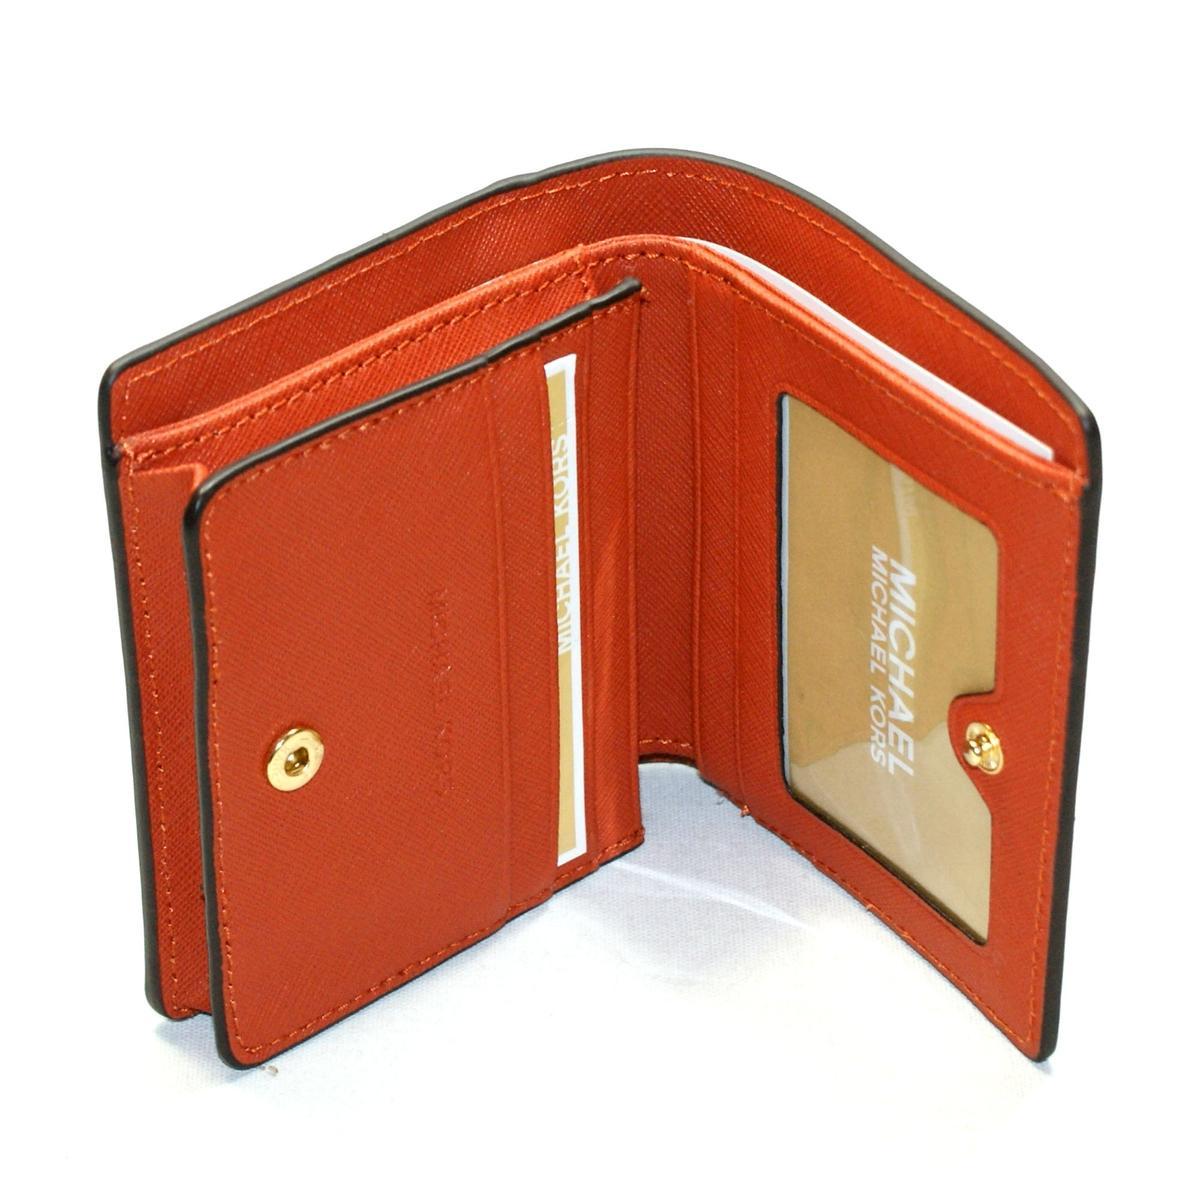 Michael Kors Jet Set Travel Carryall Card Case Leather